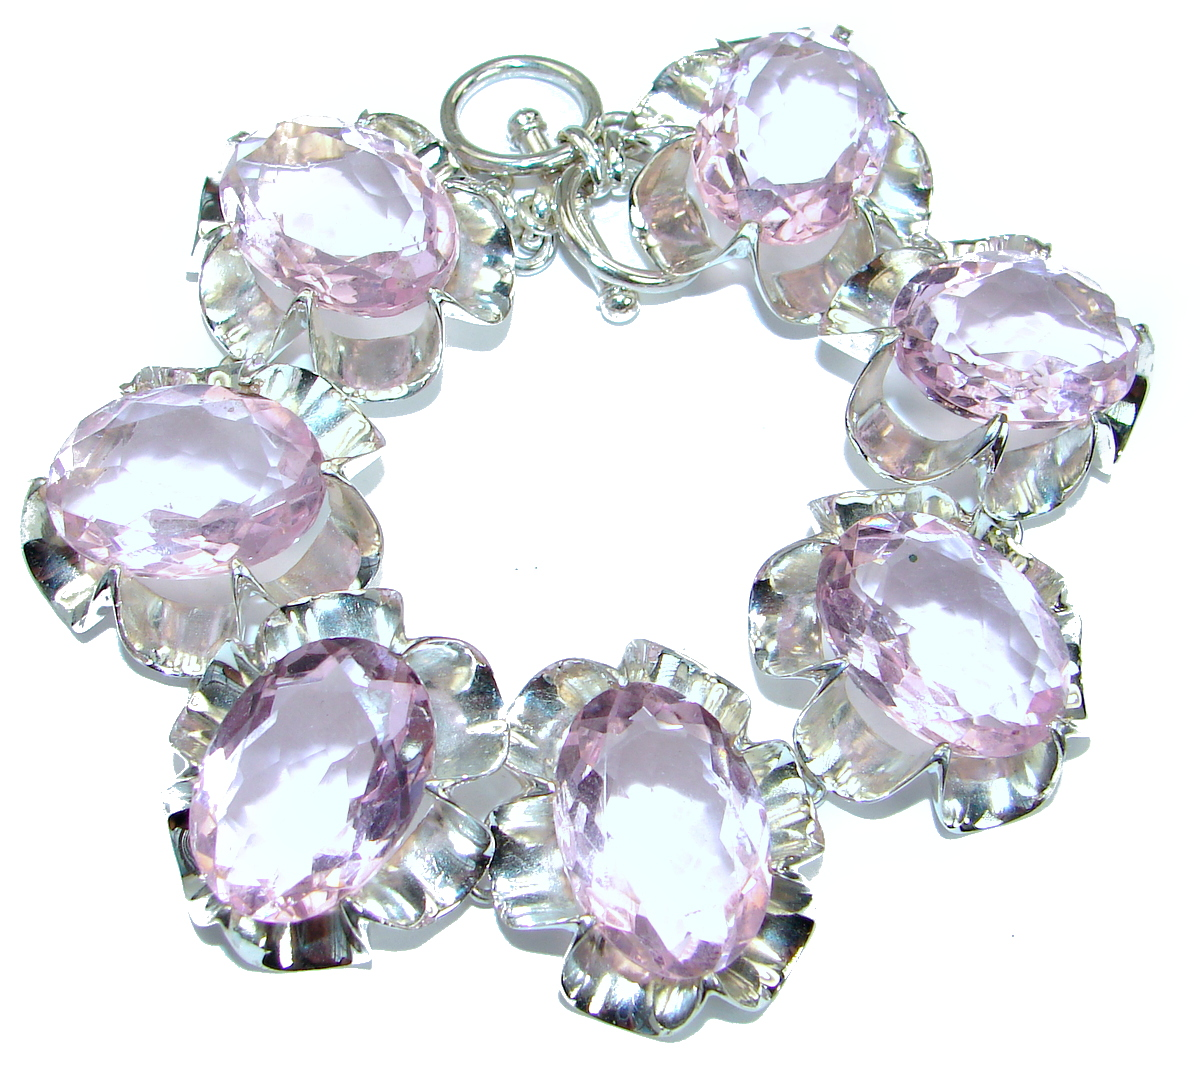 Huge Chic Oval Cut Princess  Quartz .925 Sterling Silver handcrafted Bracelet